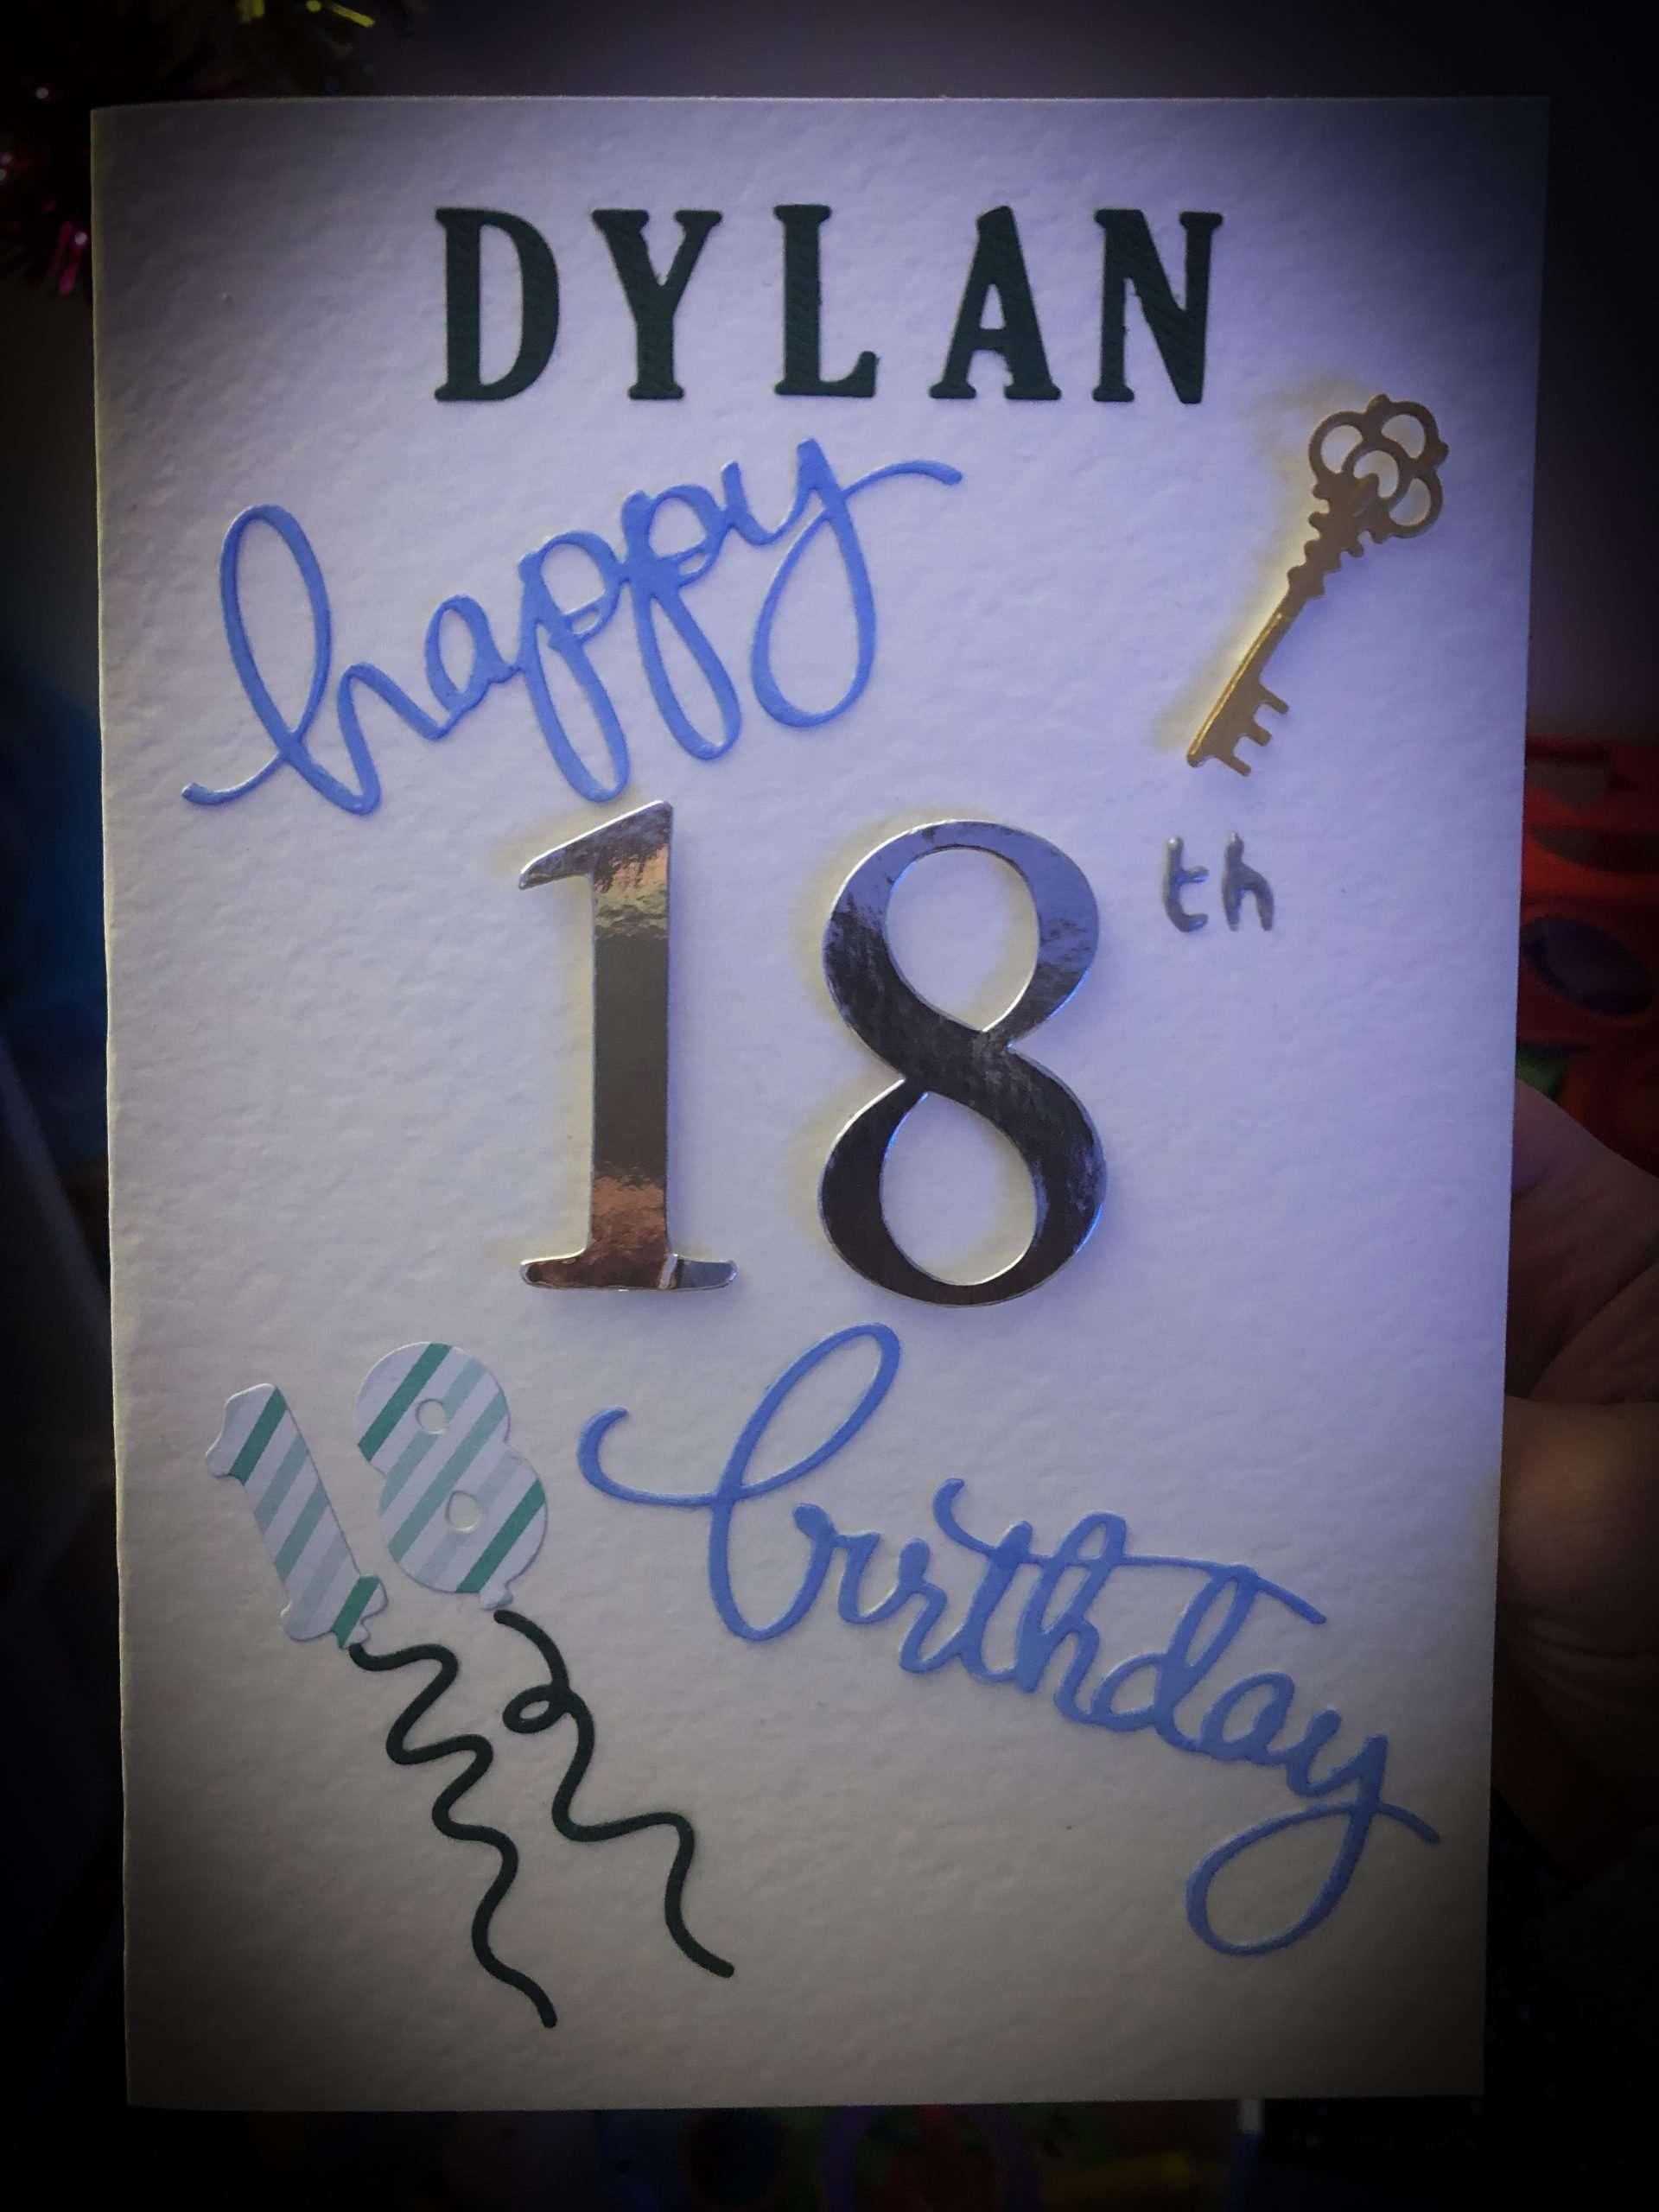 Dylans 18th Birthday card